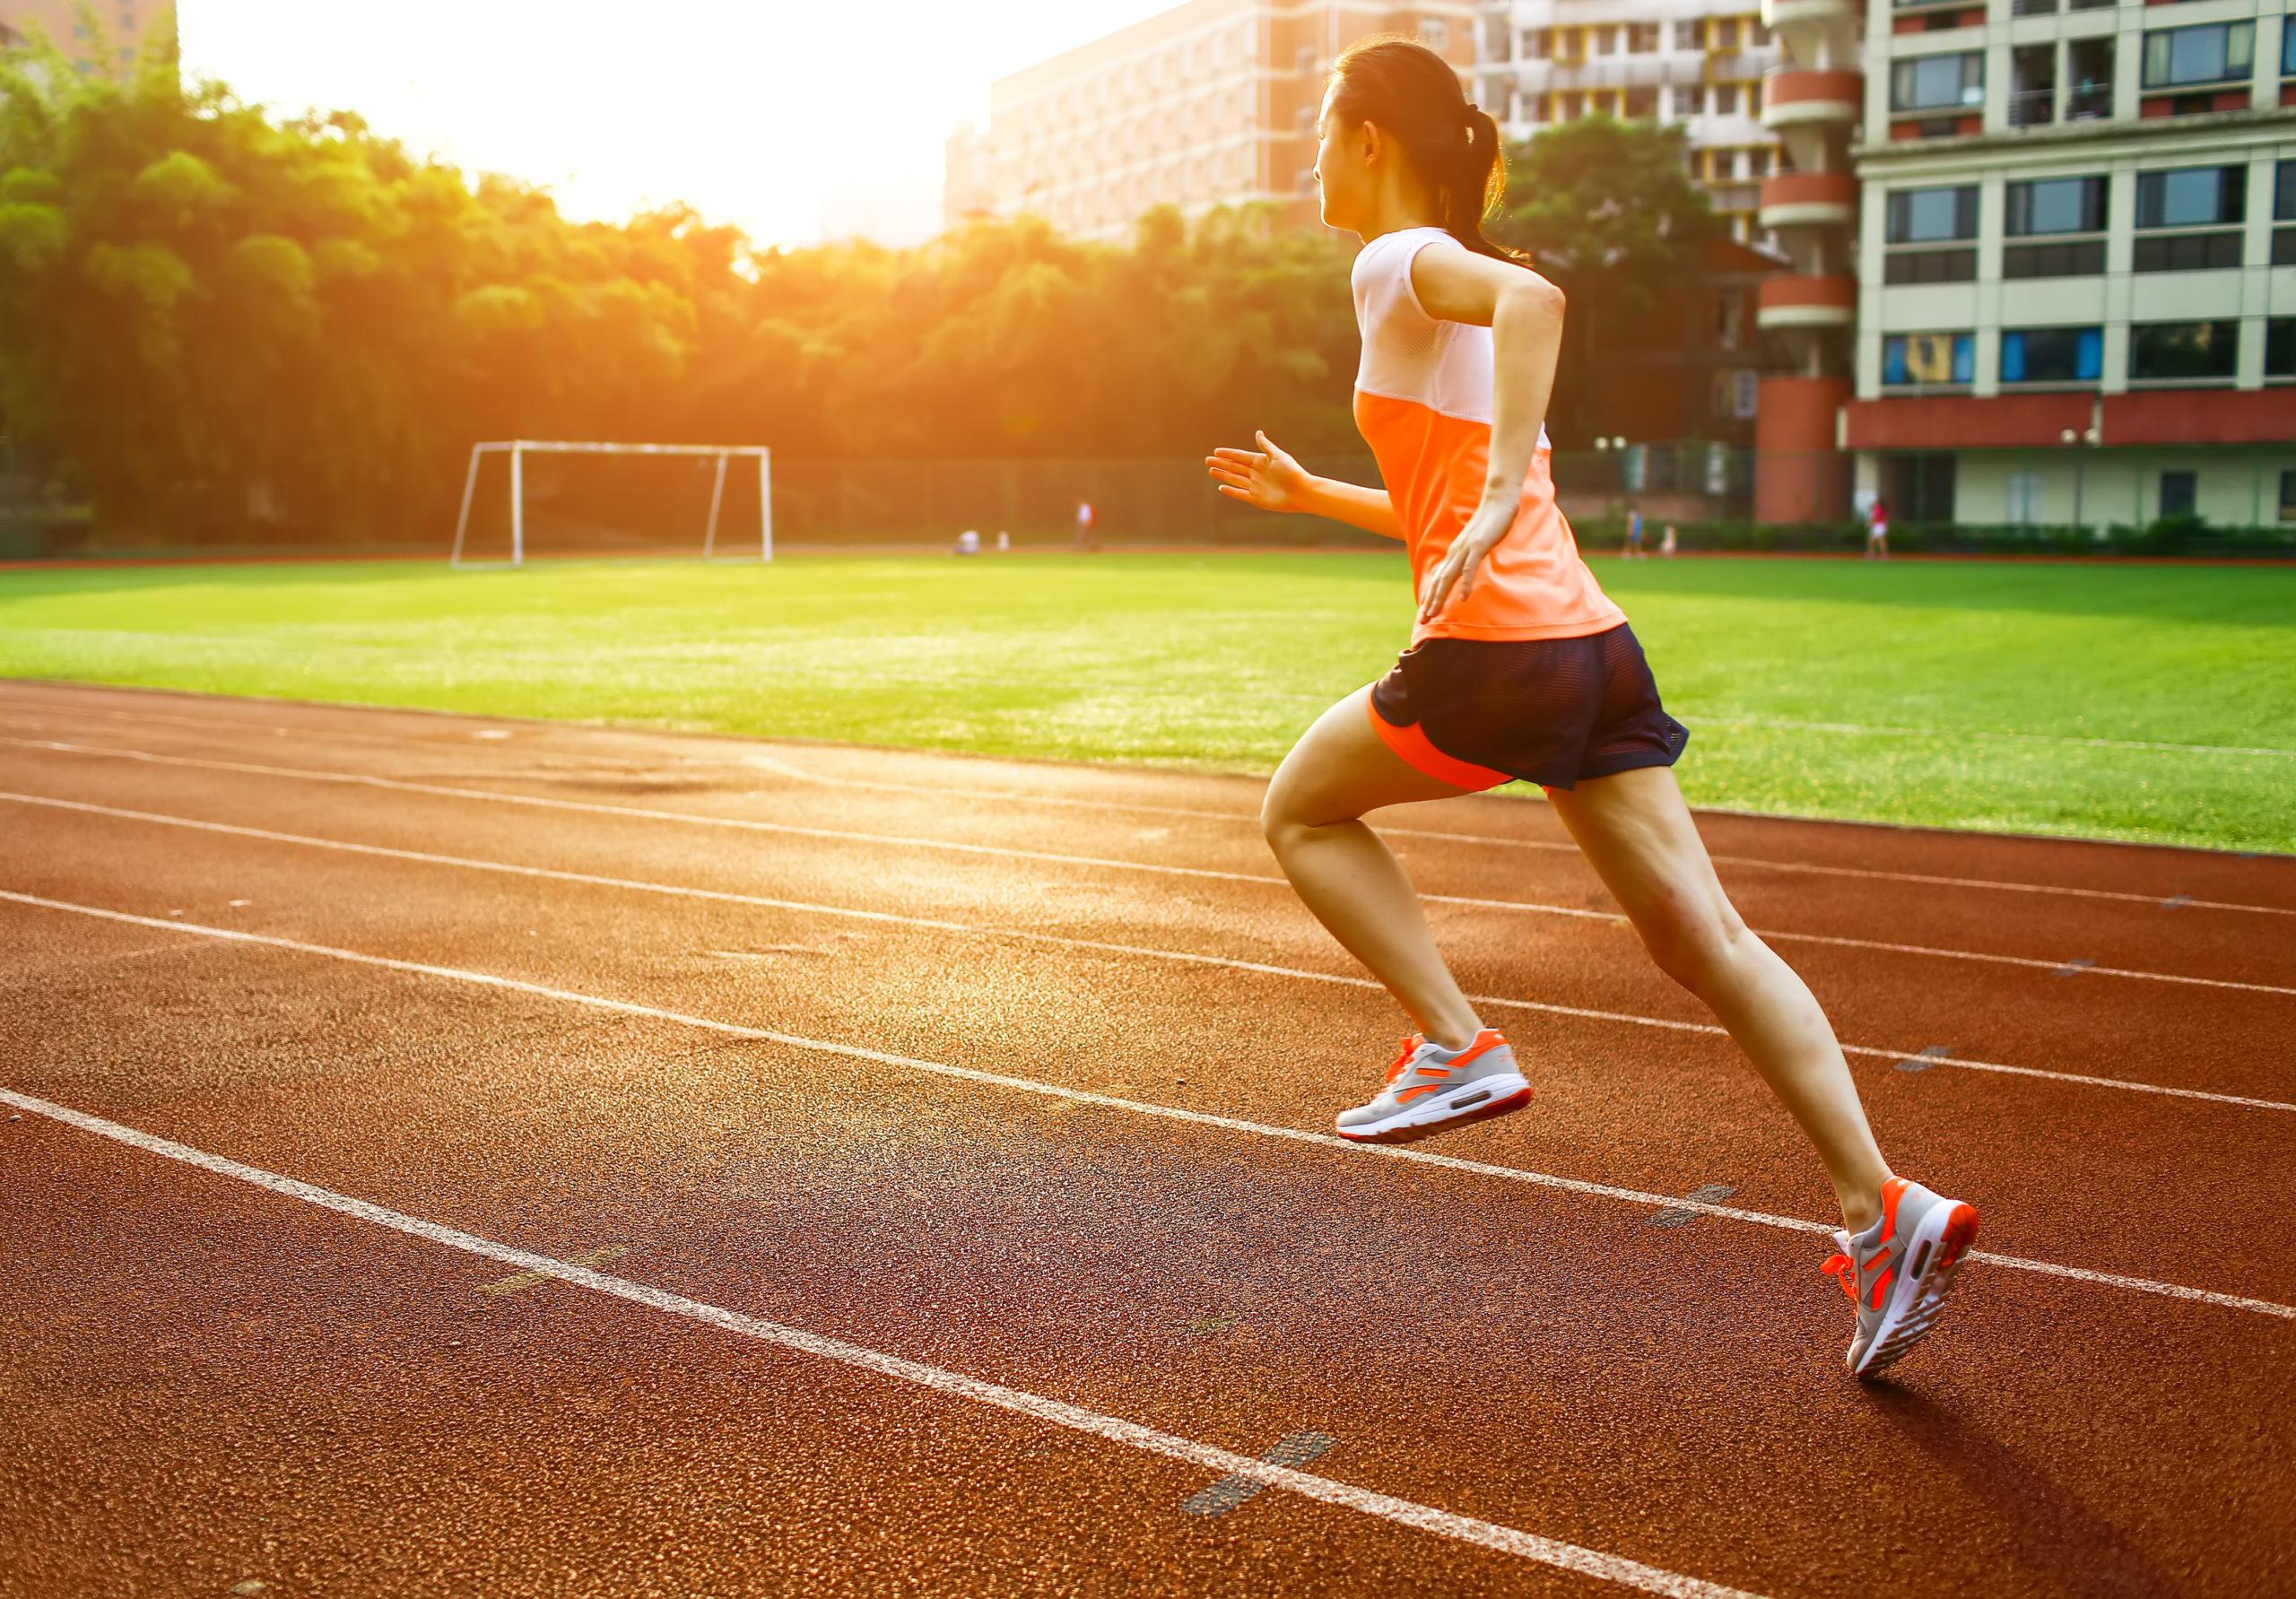 Why is there marathon work in my speed segment?